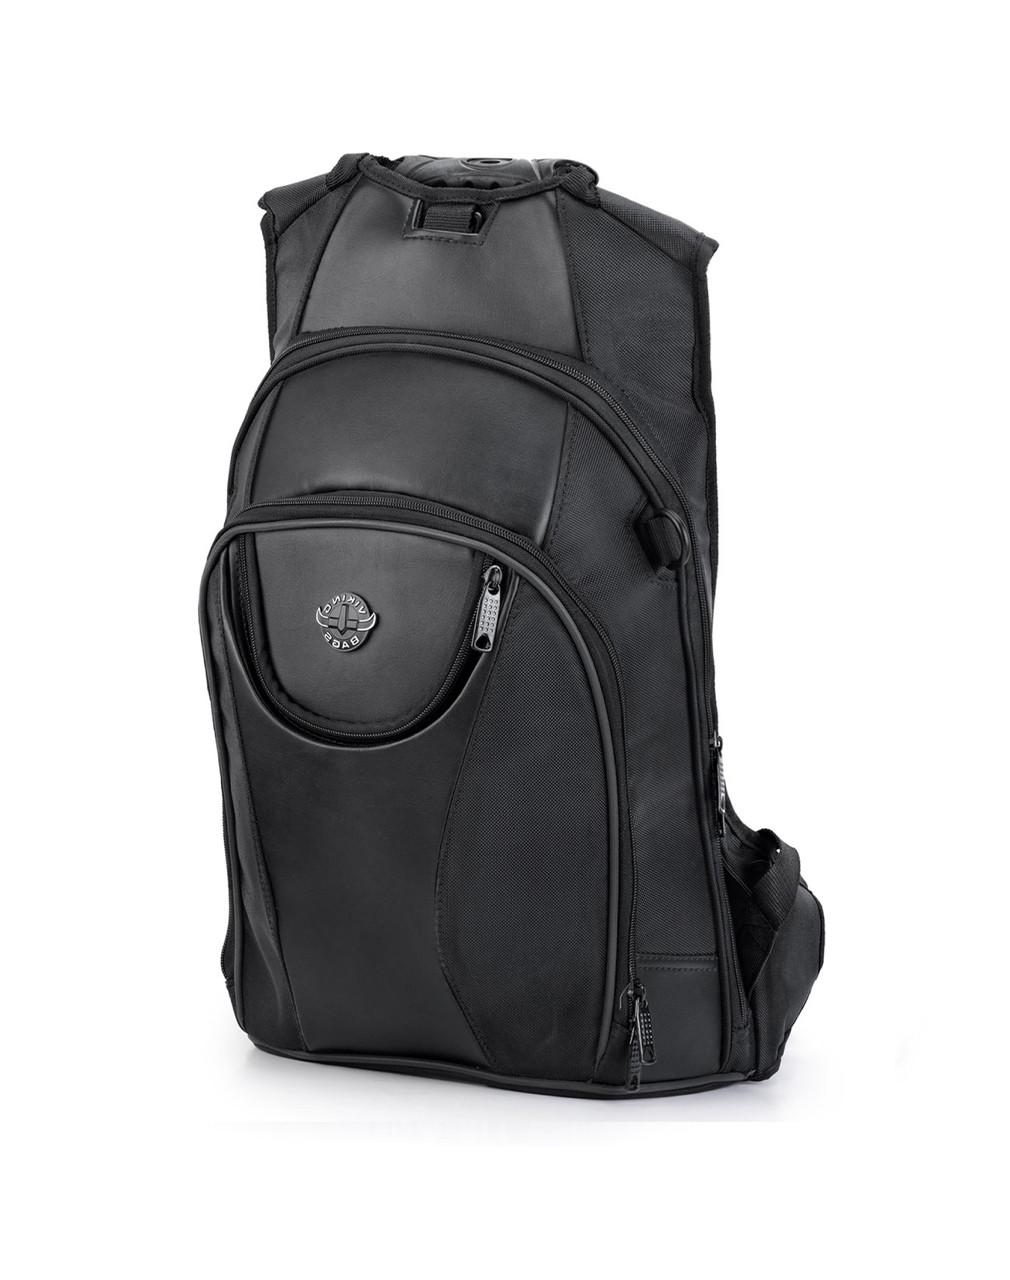 Viking Large Black Backpack For Harley Davidson Main Bag View